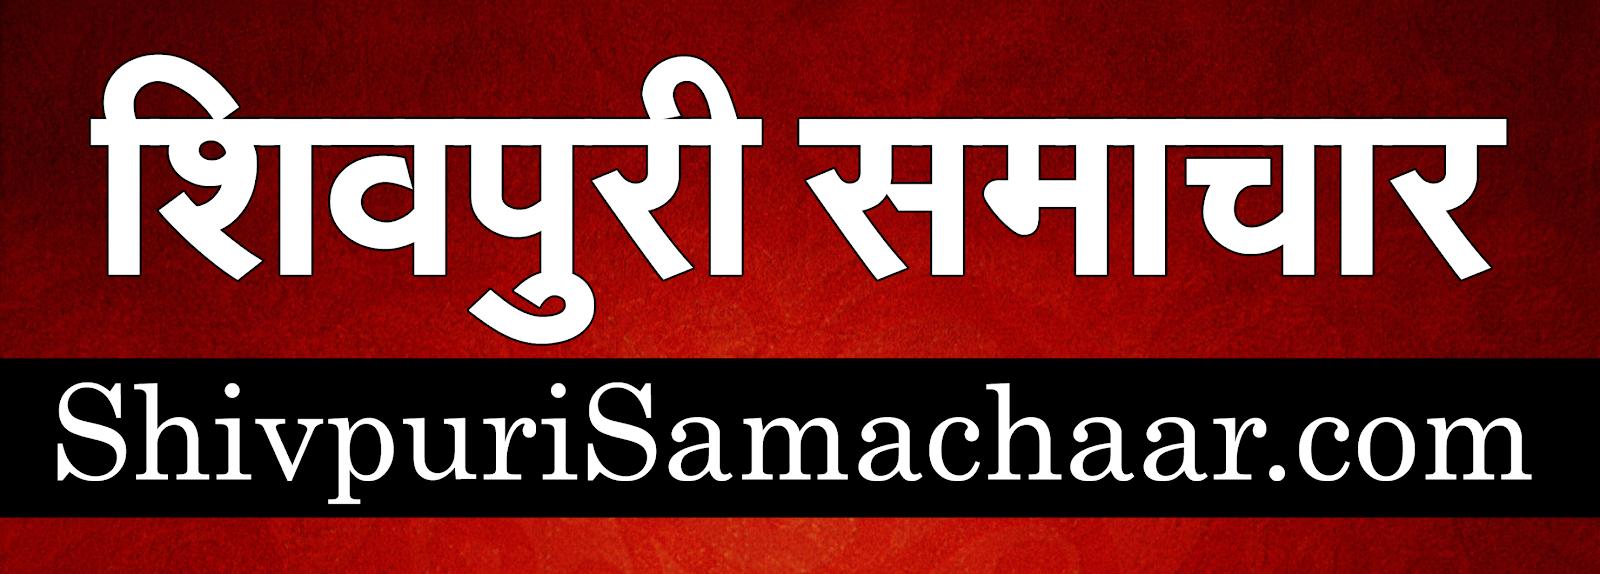 Shivpuri Samachar | No 1 News Site for Shivpuri News in Hindi (शिवपुरी समाचार)